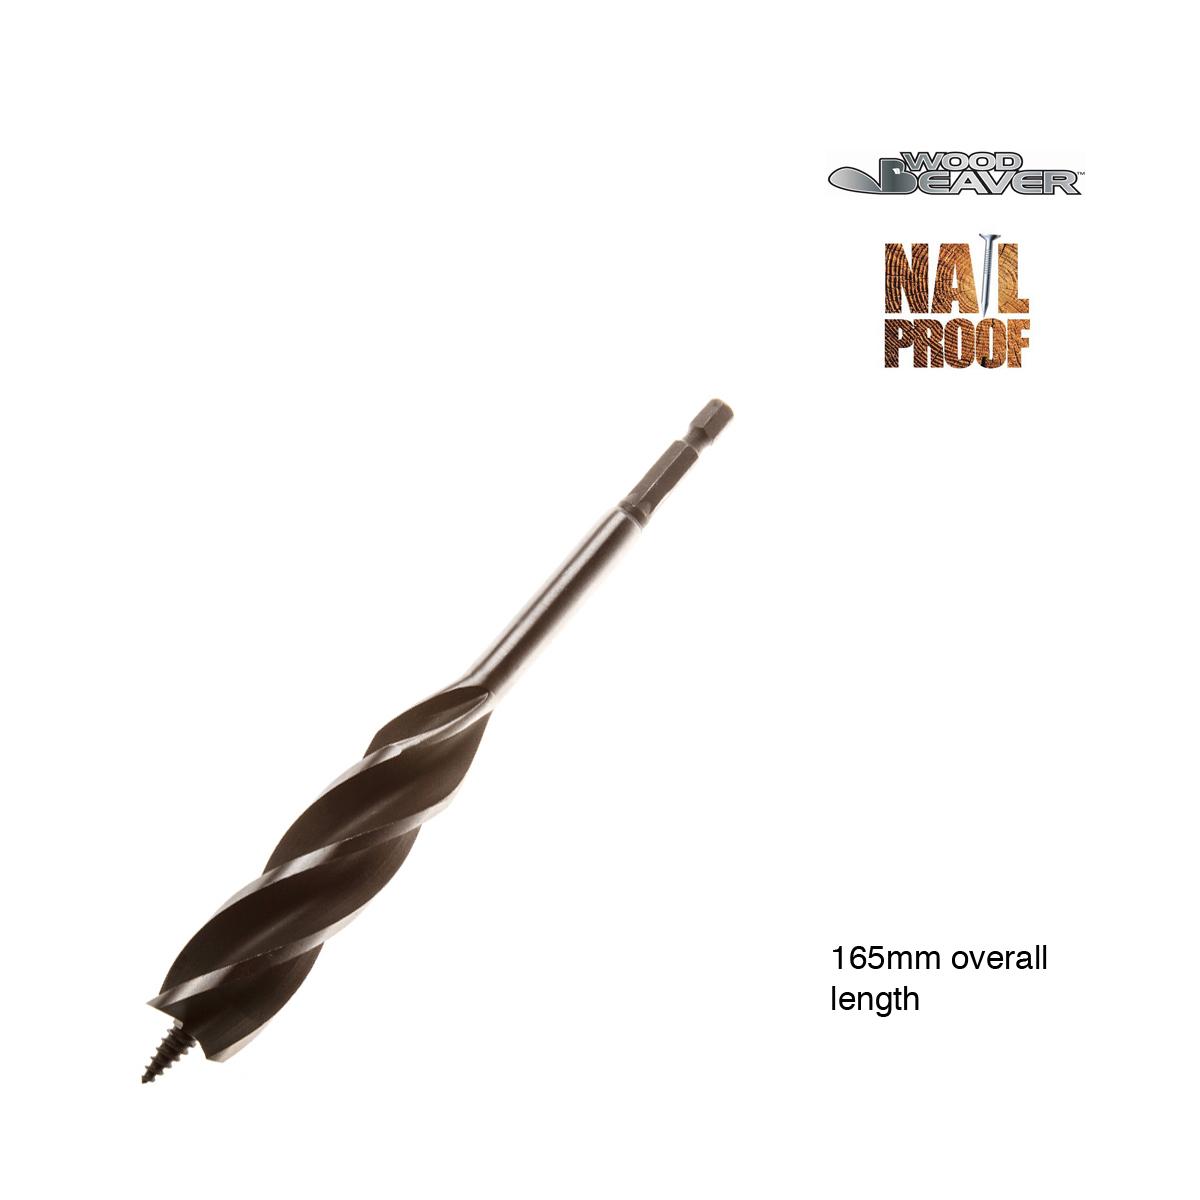 Nail-Proof WoodBeaver